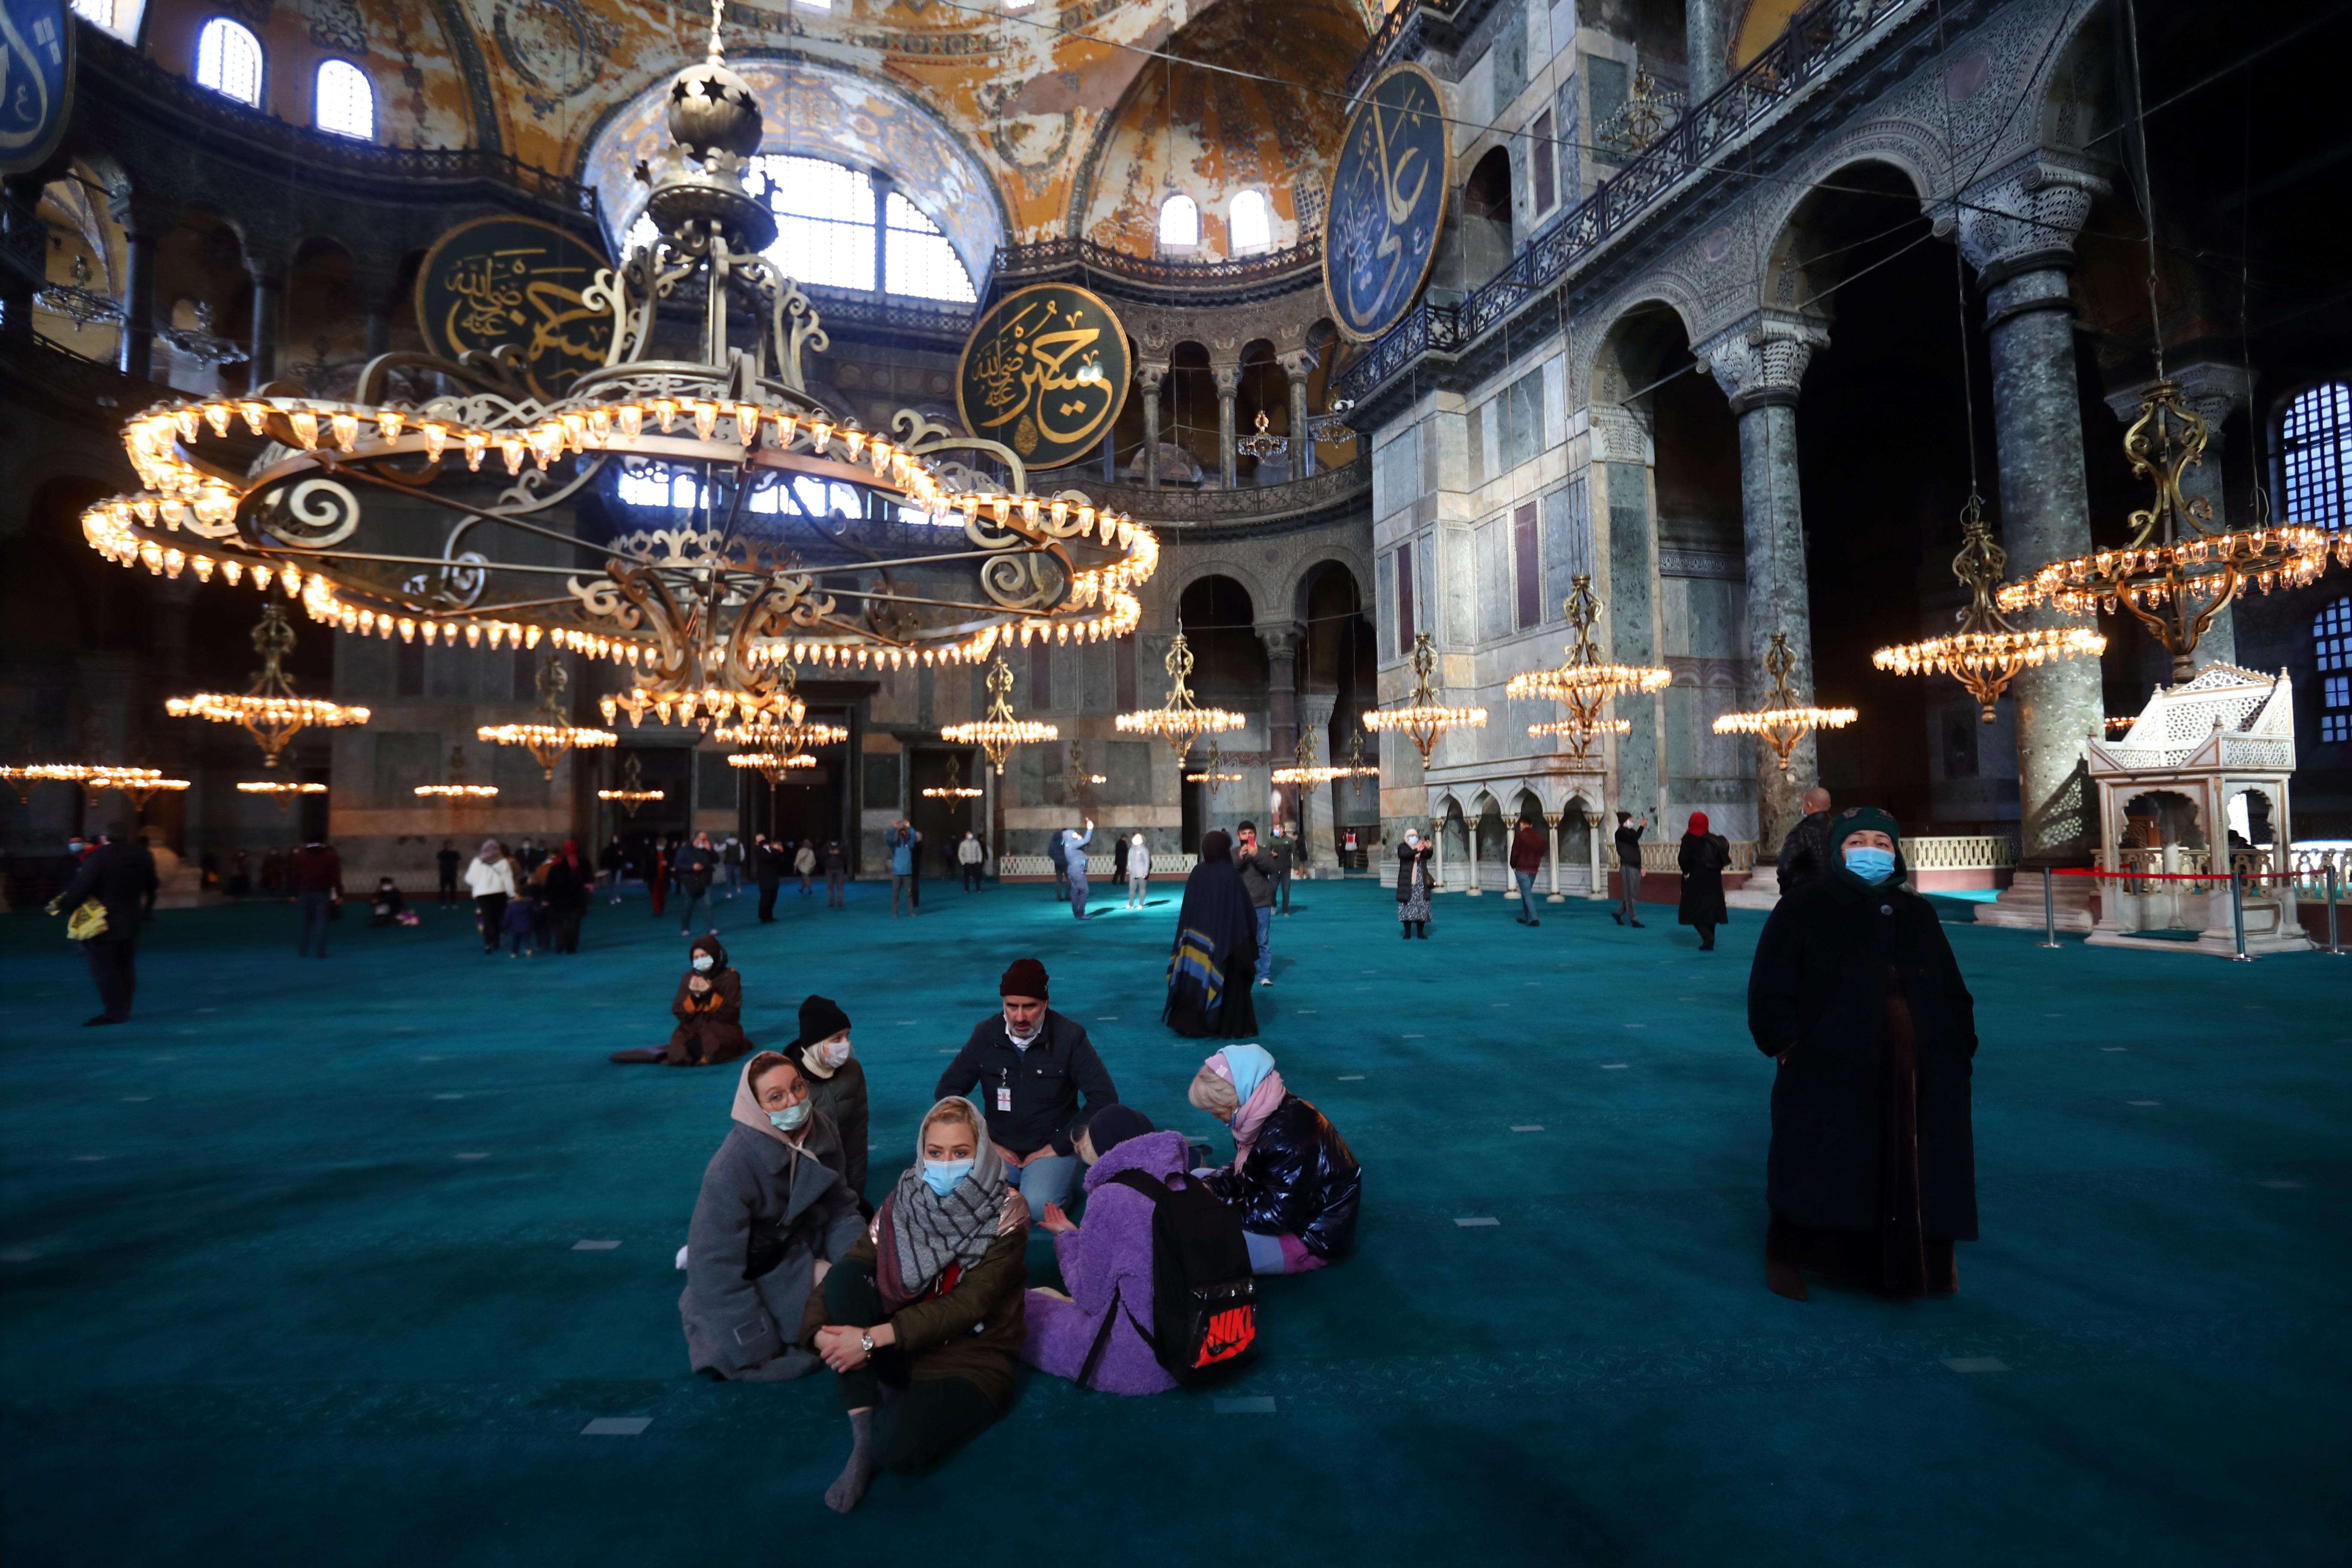 Russian tourists pause as they visit Ayasofya-i Kebir Camii or Hagia Sophia Grand Mosque amid the coronavirus disease (COVID-19) outbreak in Istanbul, Turkey January 29, 2021. REUTERS/Murad Sezer/Files